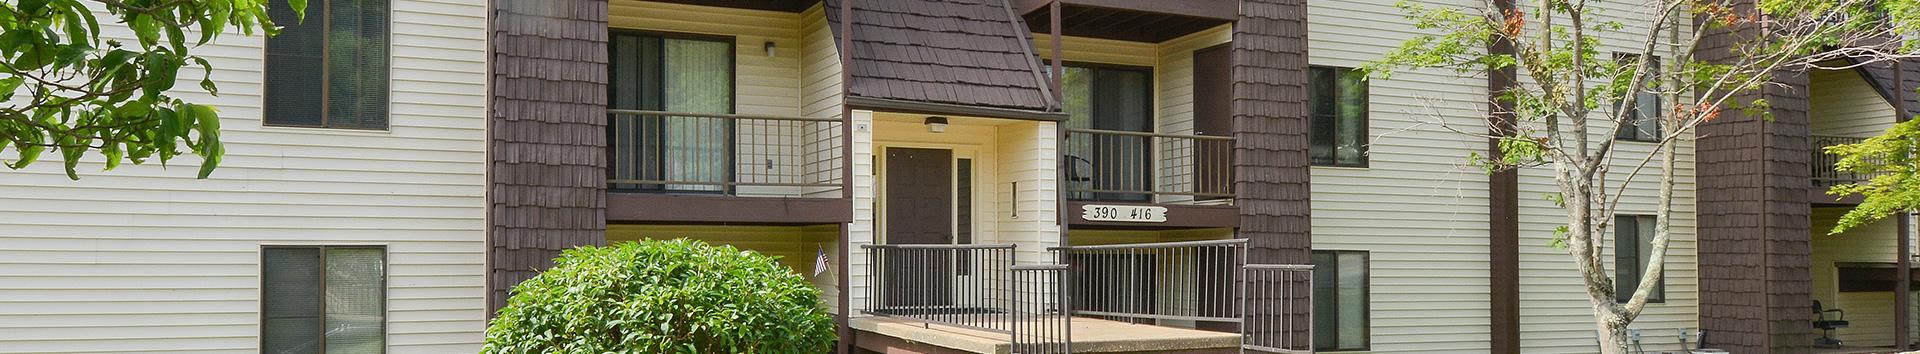 Exterior view of Roxalana Hills Apartments at Manor Communities, Charleston/West Virginia